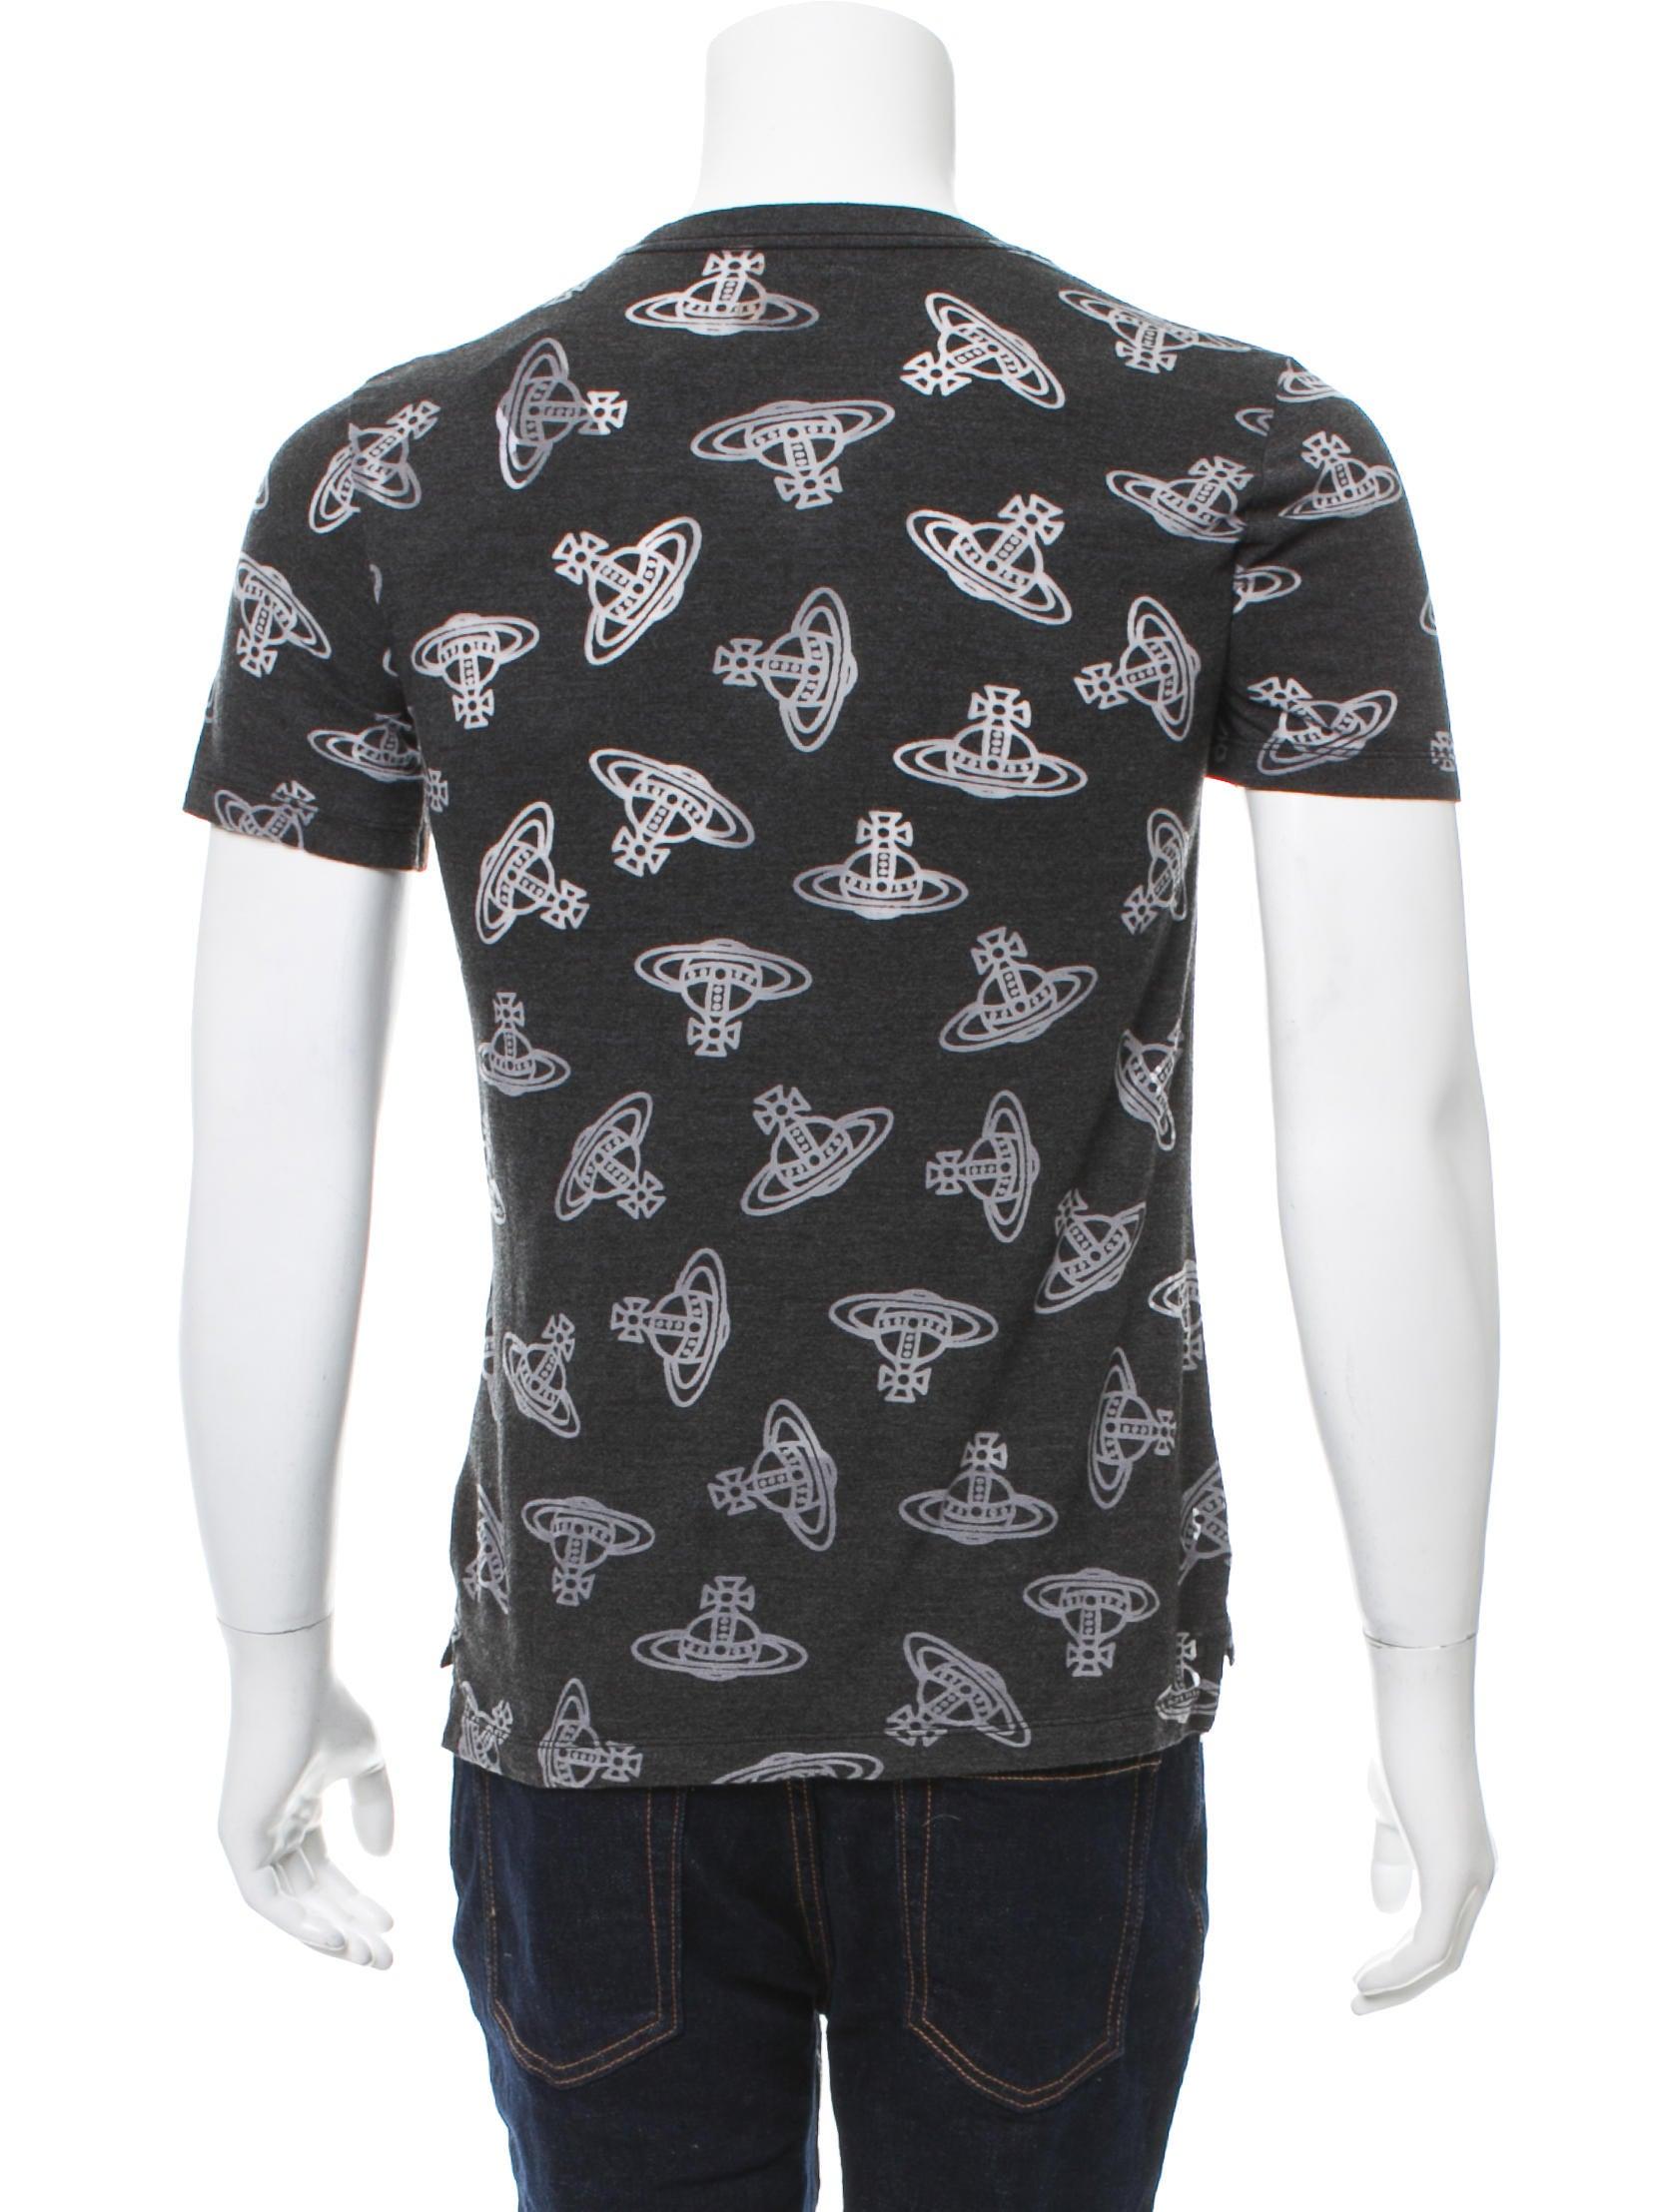 Vivienne westwood anglomania time machine print t shirt w for Machine to print shirts